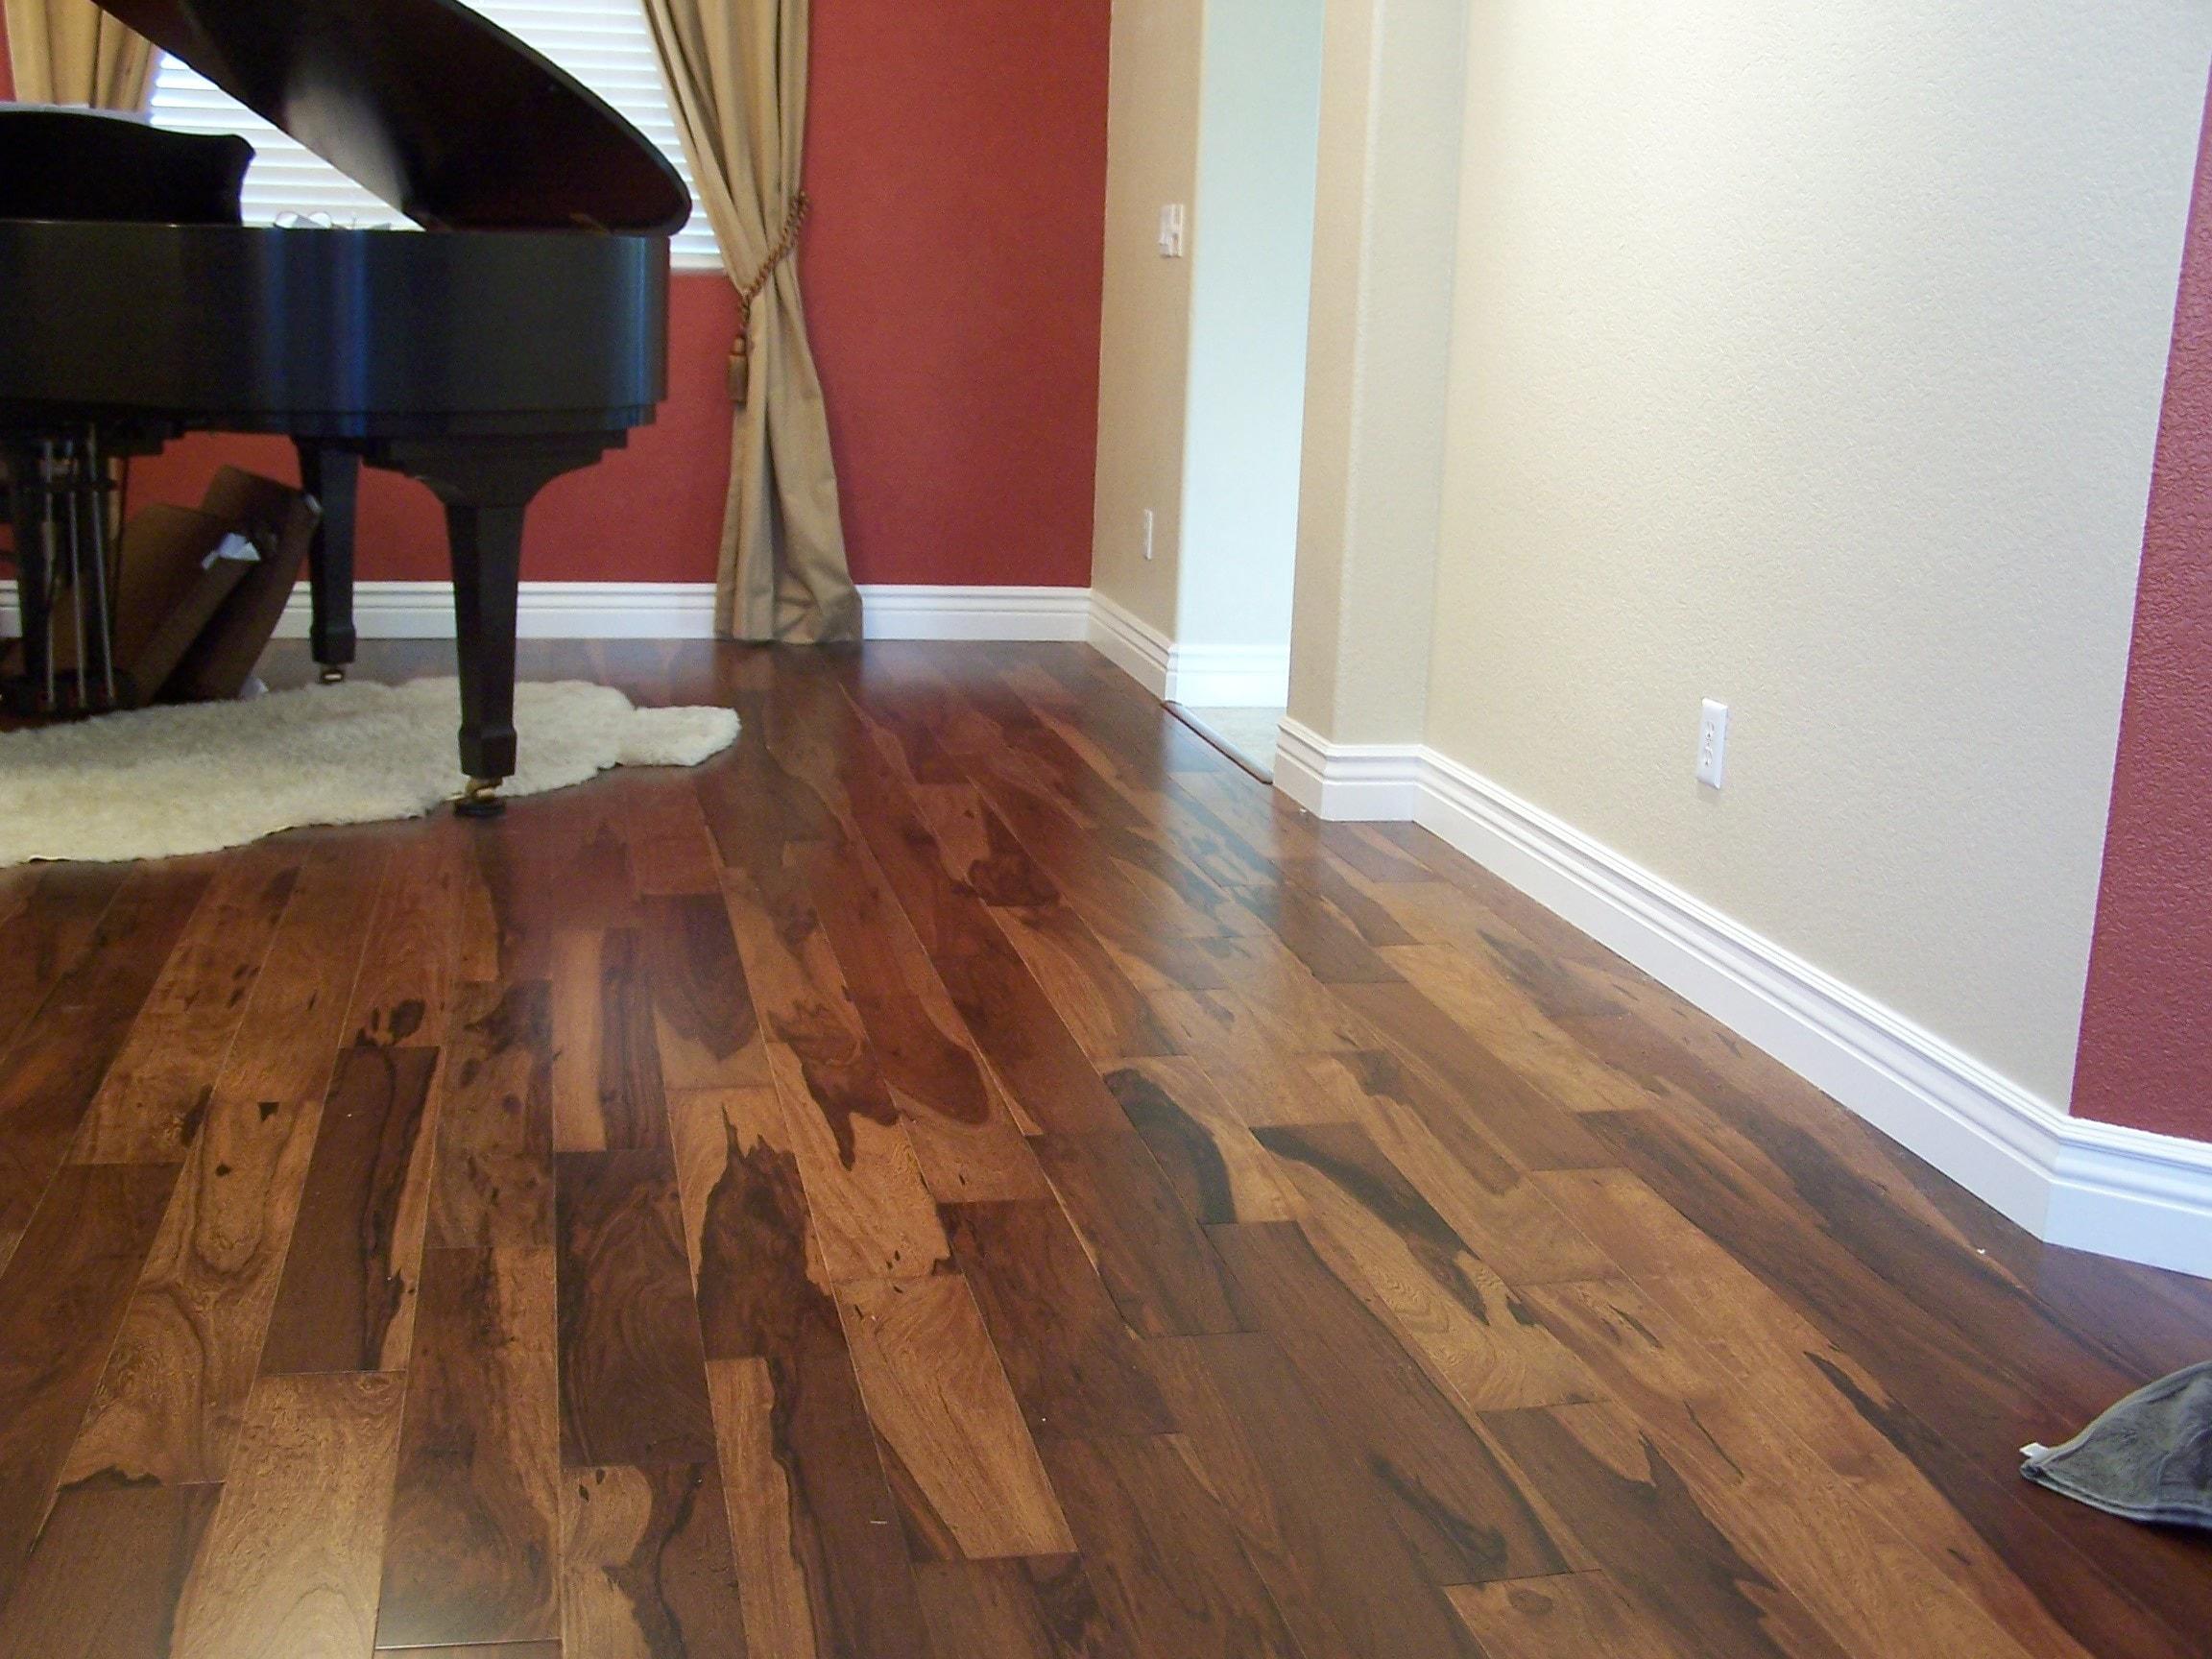 pacific reviews rchive wood wht sale pecan brazilian flooring pcific hardness hickory floor pecn hardwood